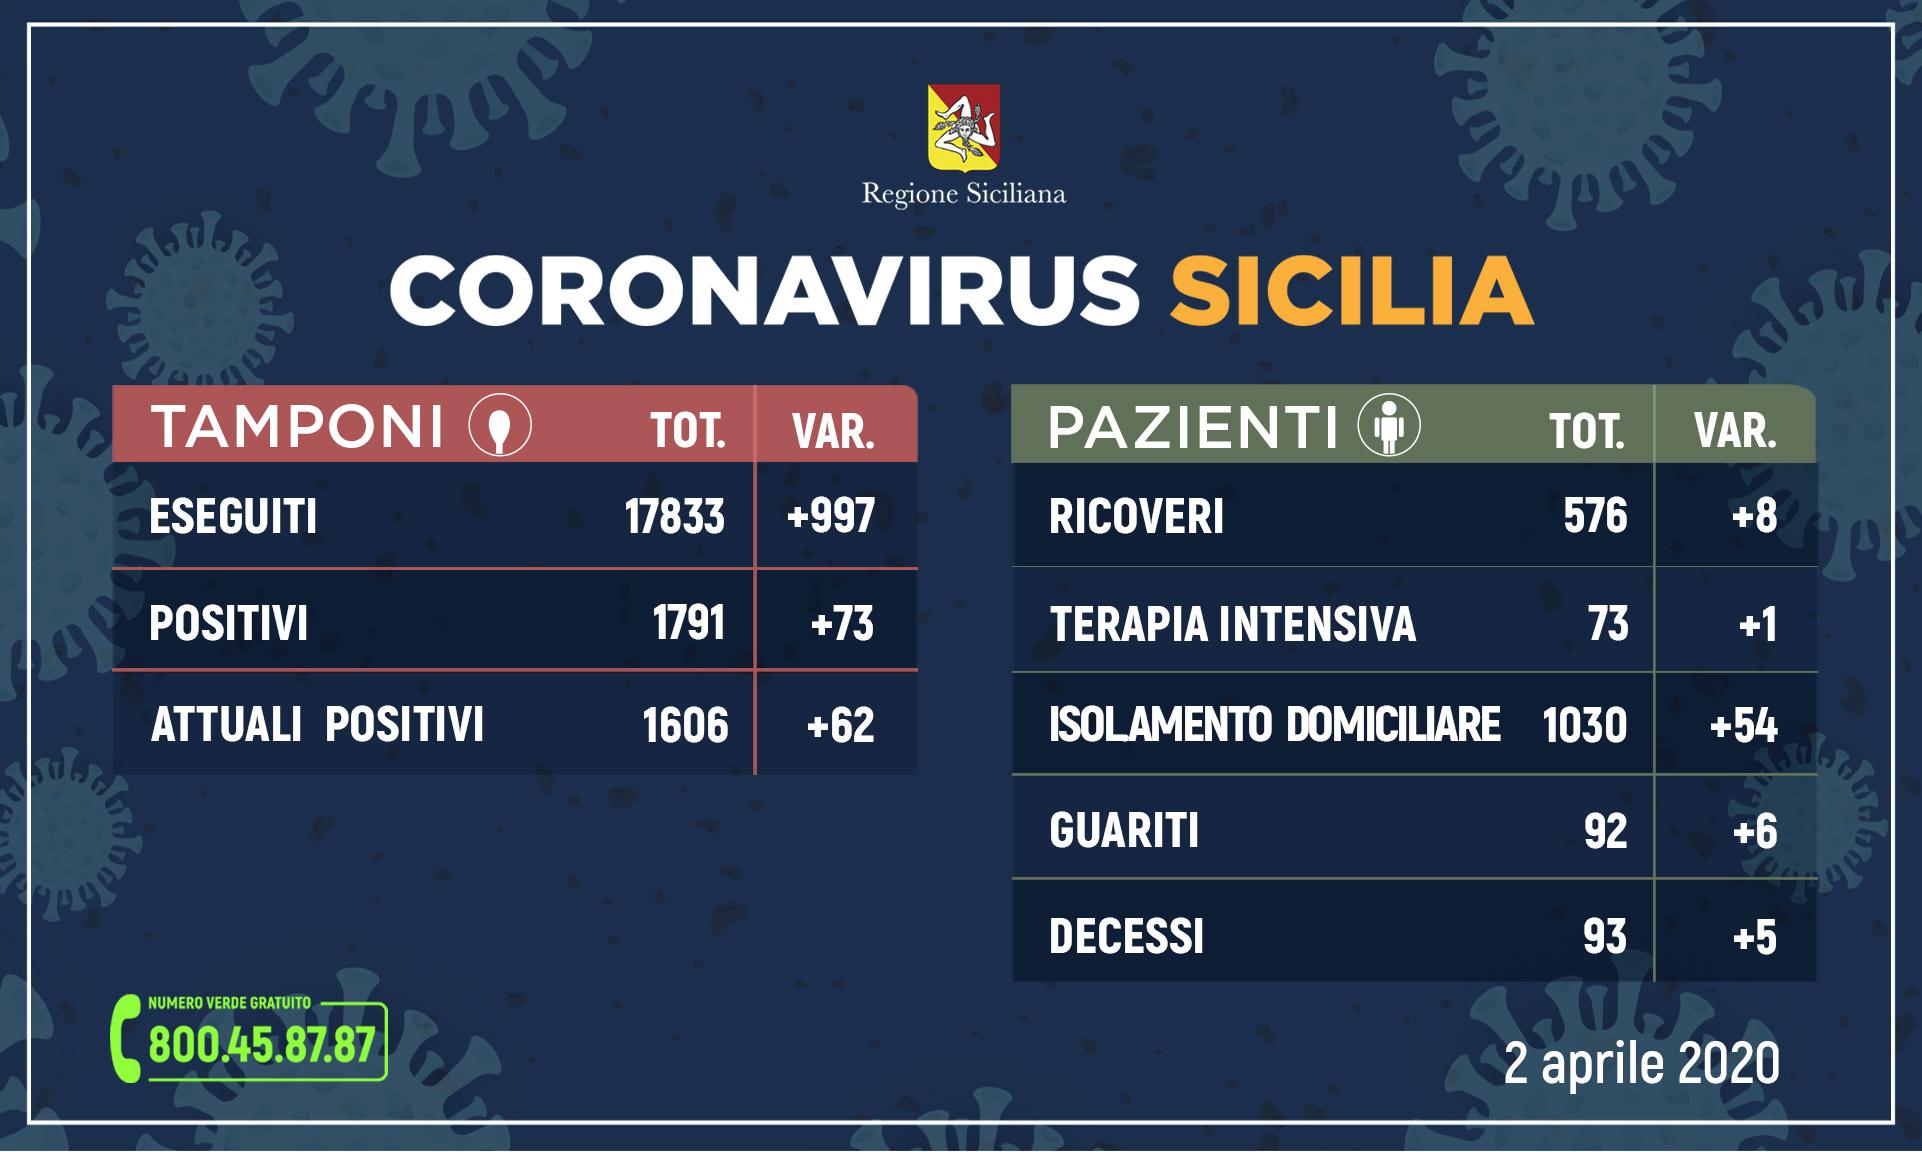 2 aprile, Coronavirus in Sicilia (2)